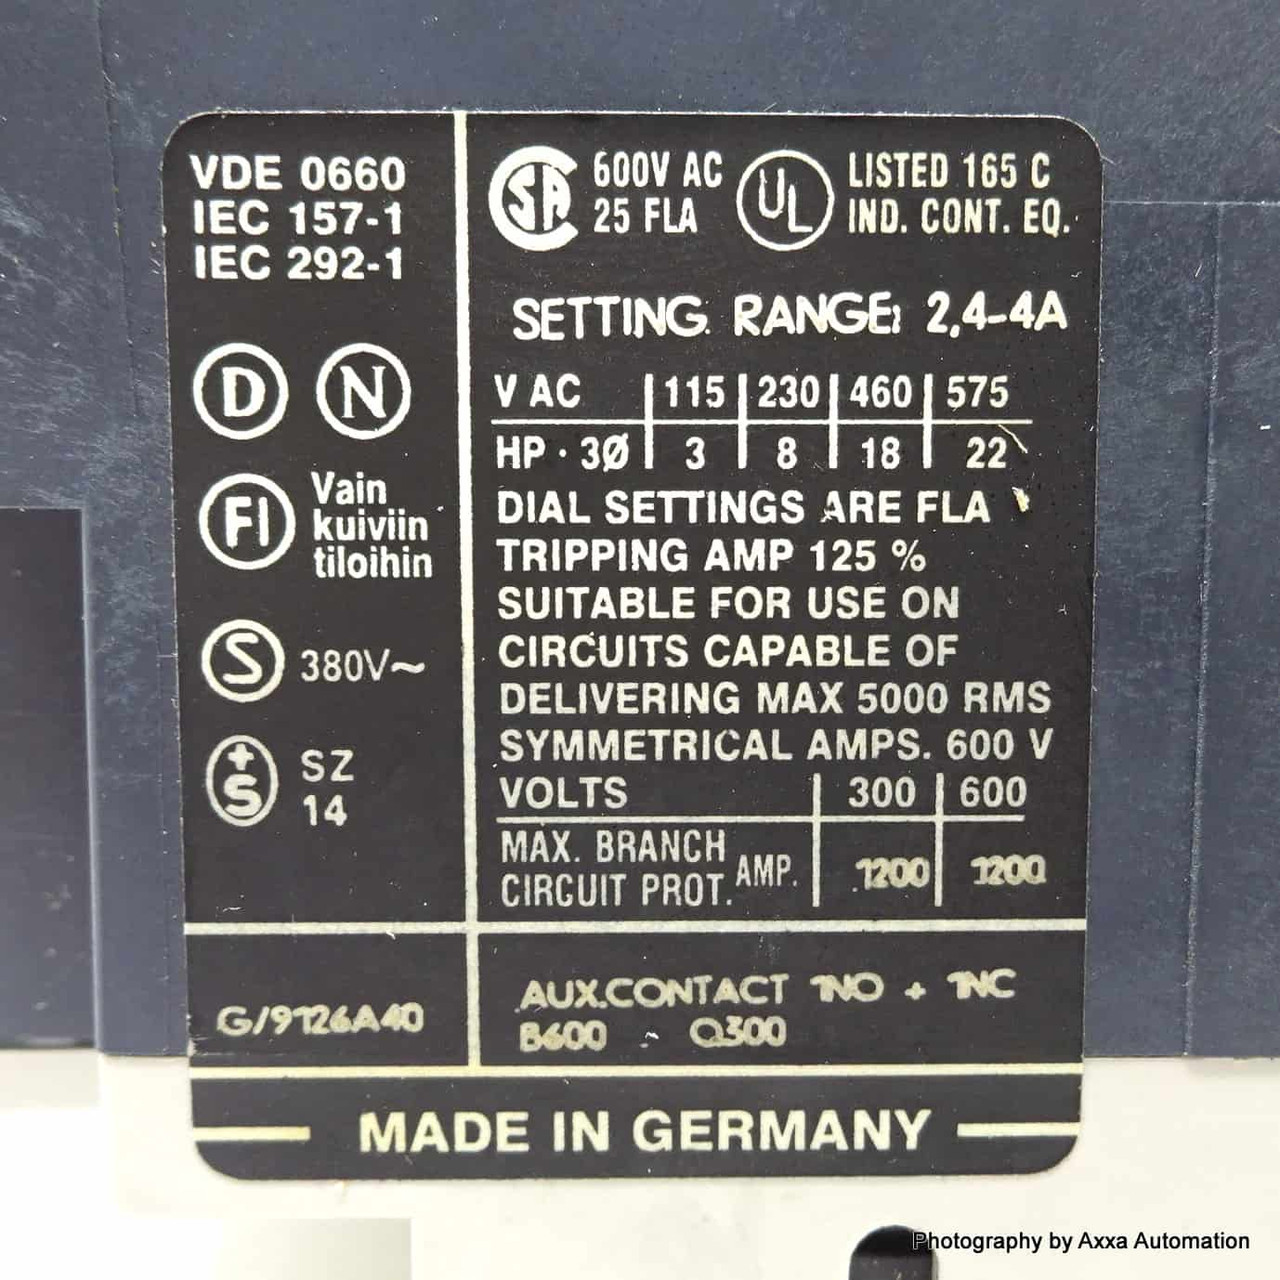 Siemens moteur disjoncteur 2,4-4a 3vu1300-1tj00